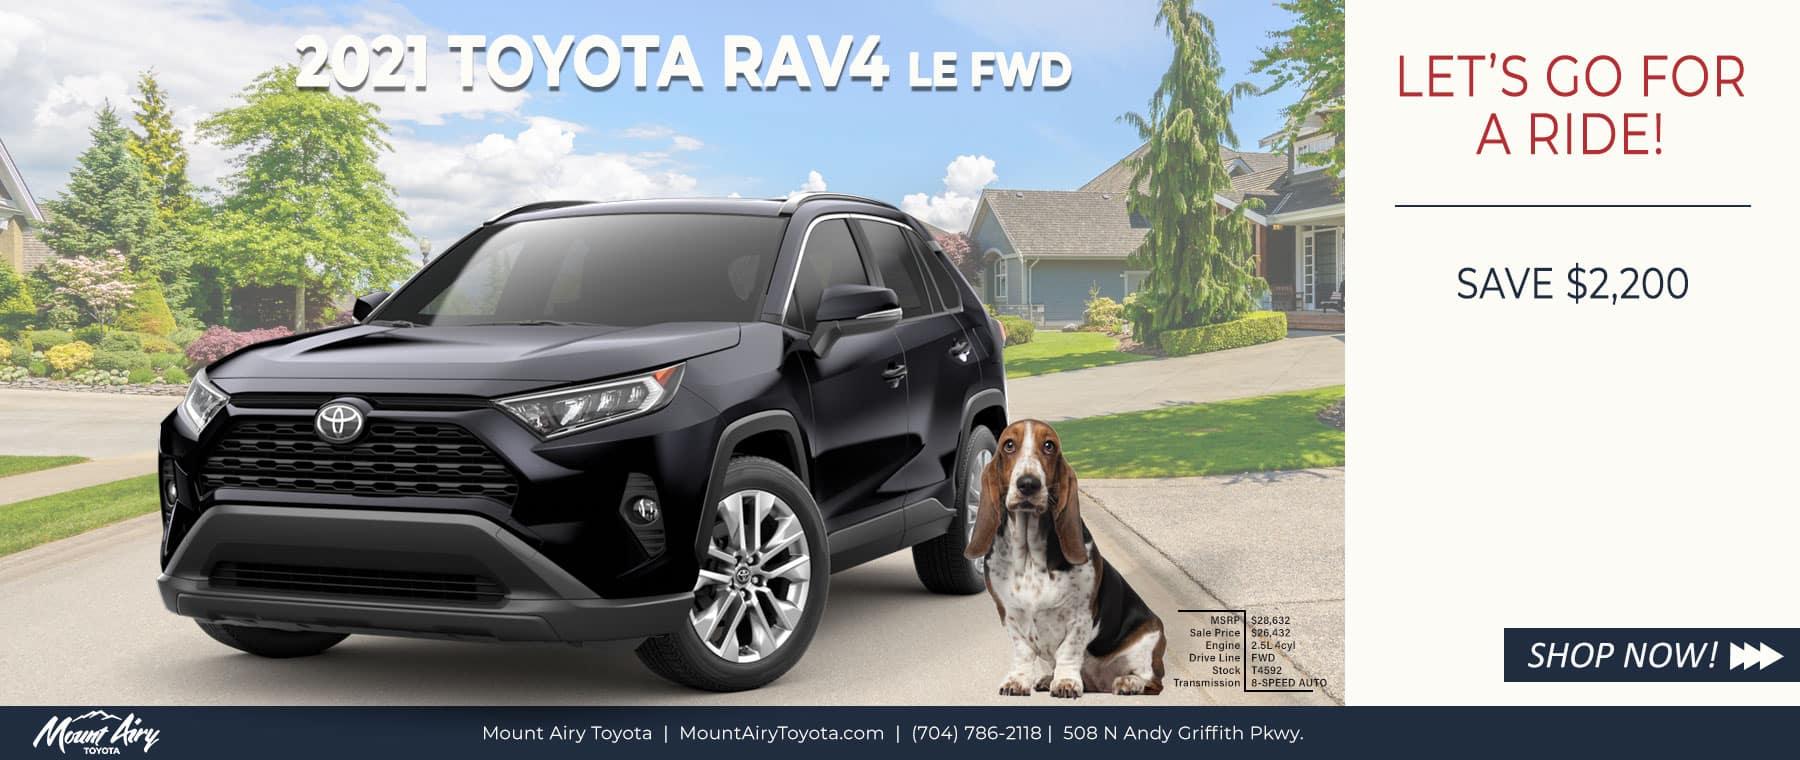 Toyota_April_Rav4